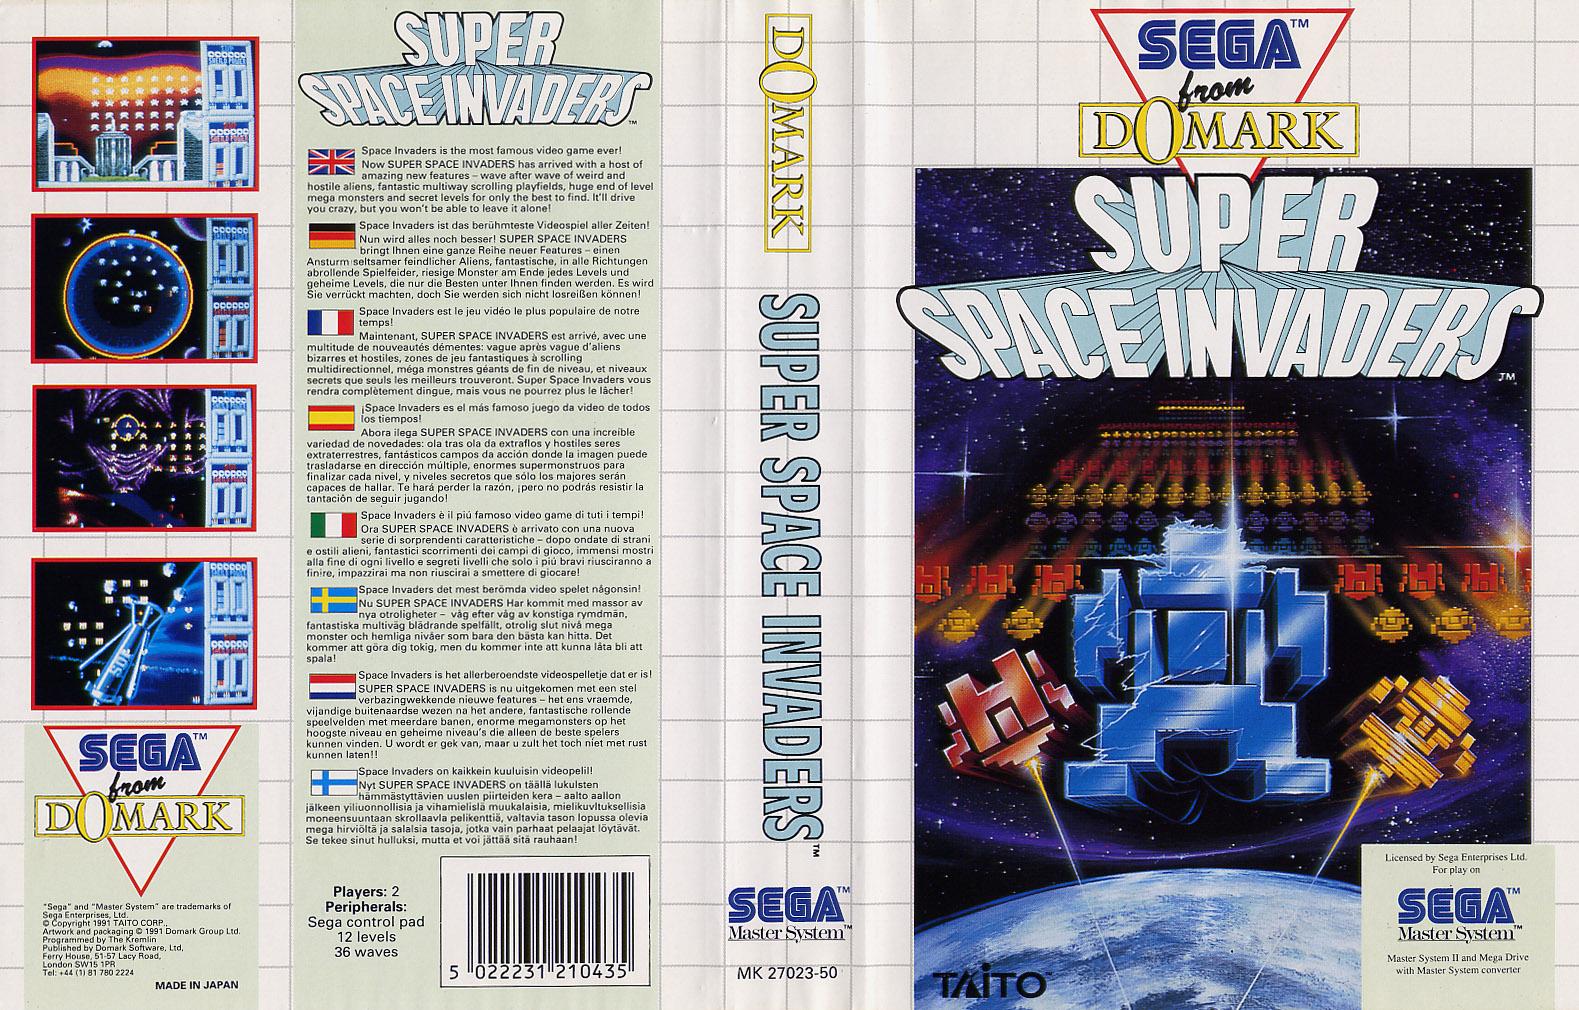 http://www.smspower.org/uploads/Scans/SuperSpaceInvaders-SMS-EU.jpg